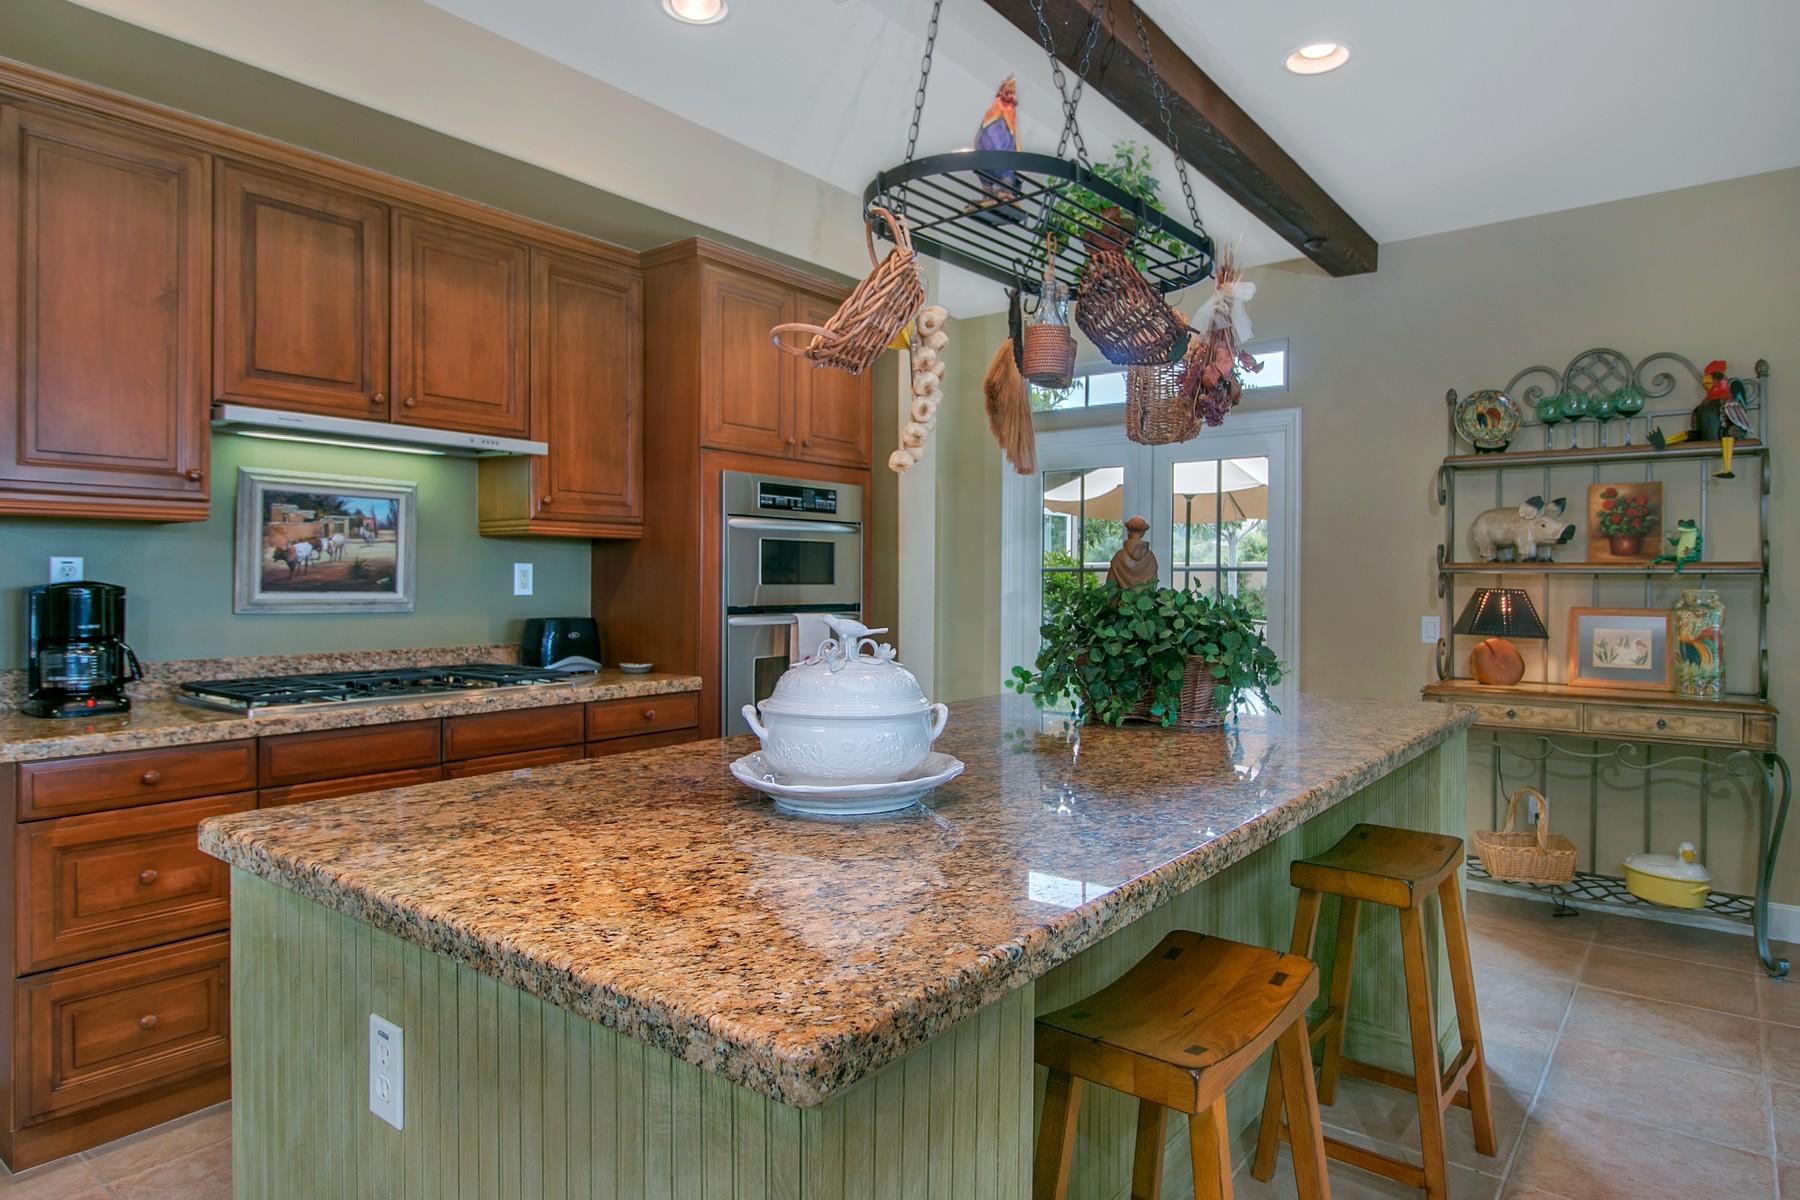 Additional photo for property listing at 7764 Sendero Angelica  San Diego, Калифорния 92127 Соединенные Штаты